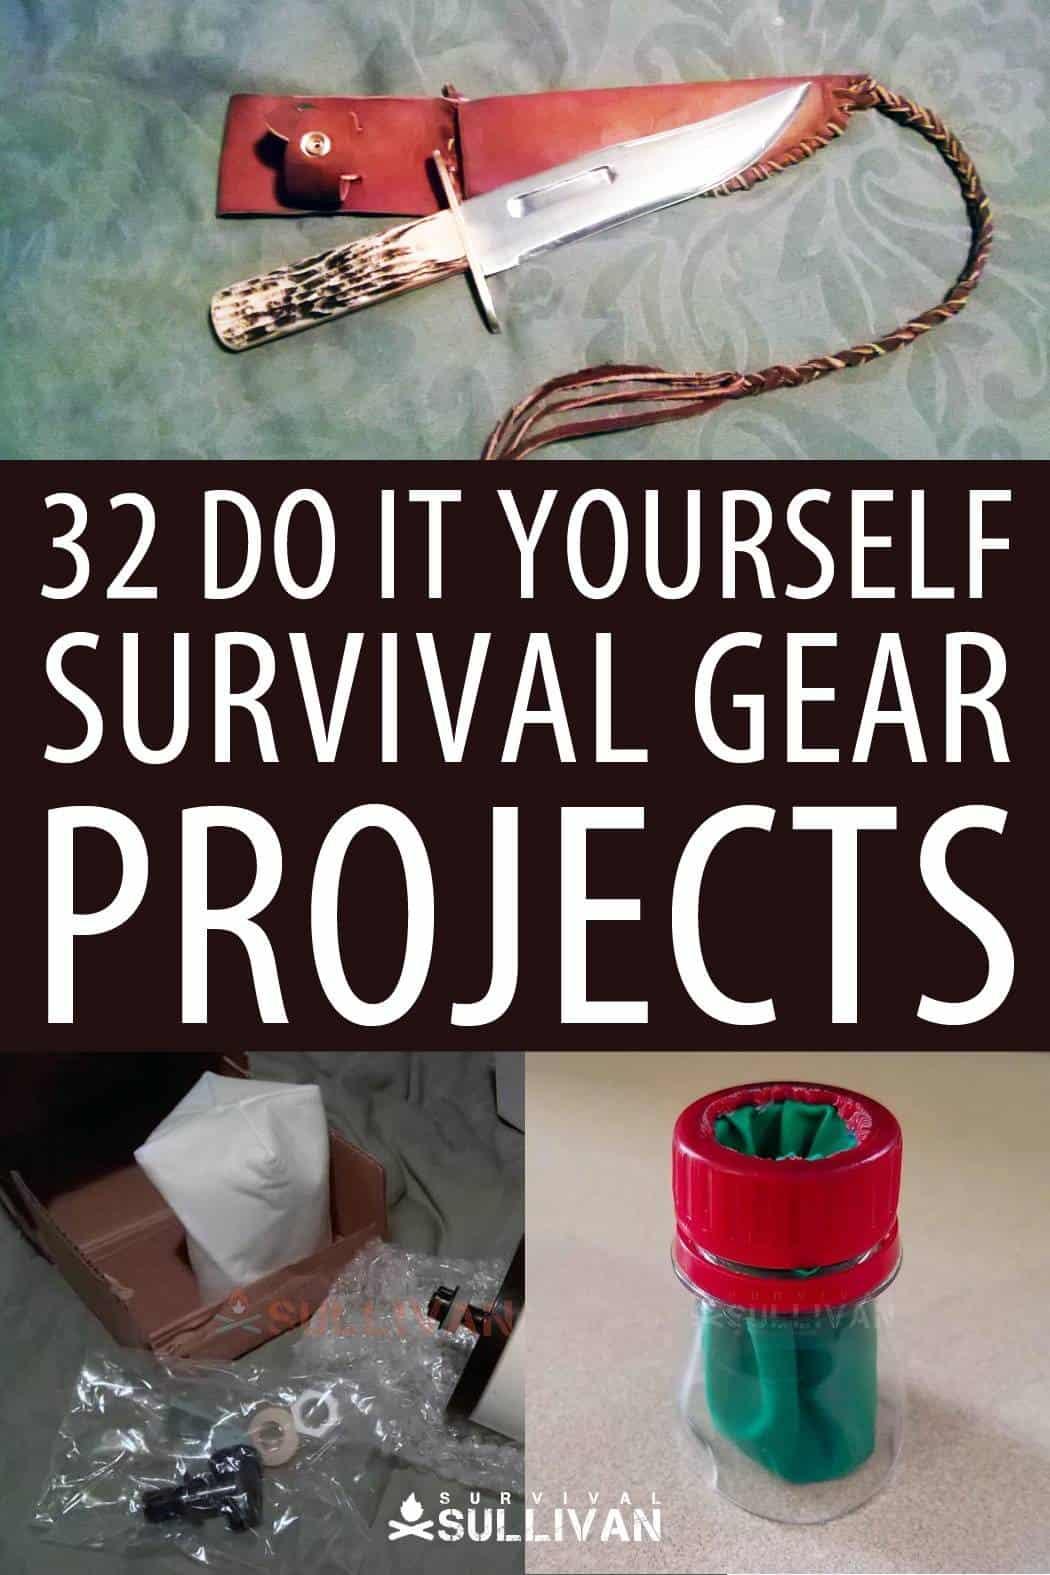 DIY survival gear pinterest image